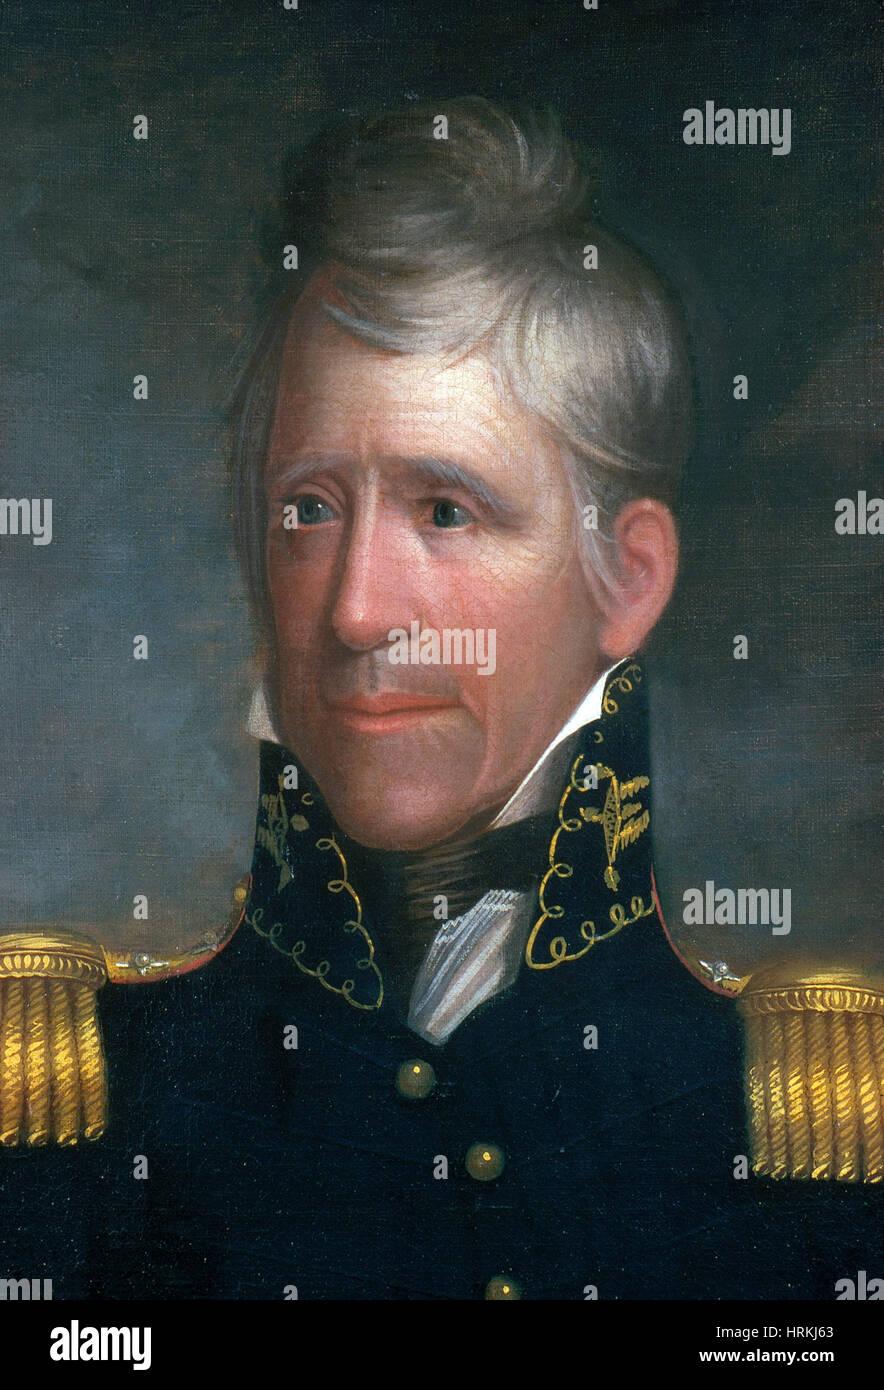 General Andrew Jackson - Stock Image